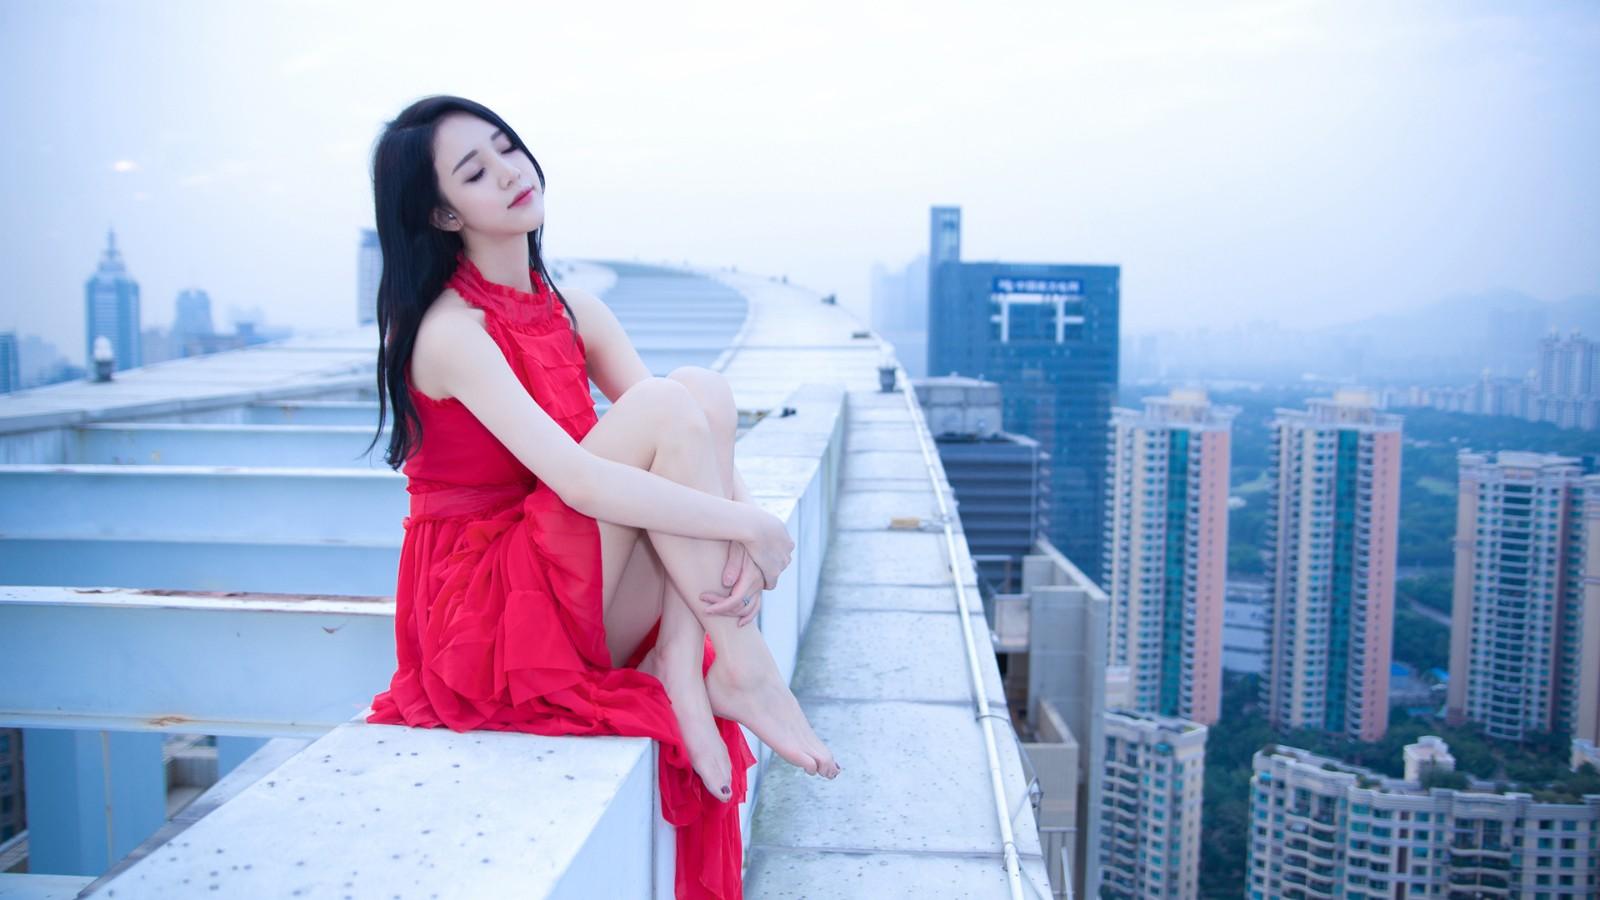 Crystal Lee 李倩倩crysta1lee桌面美女壁纸